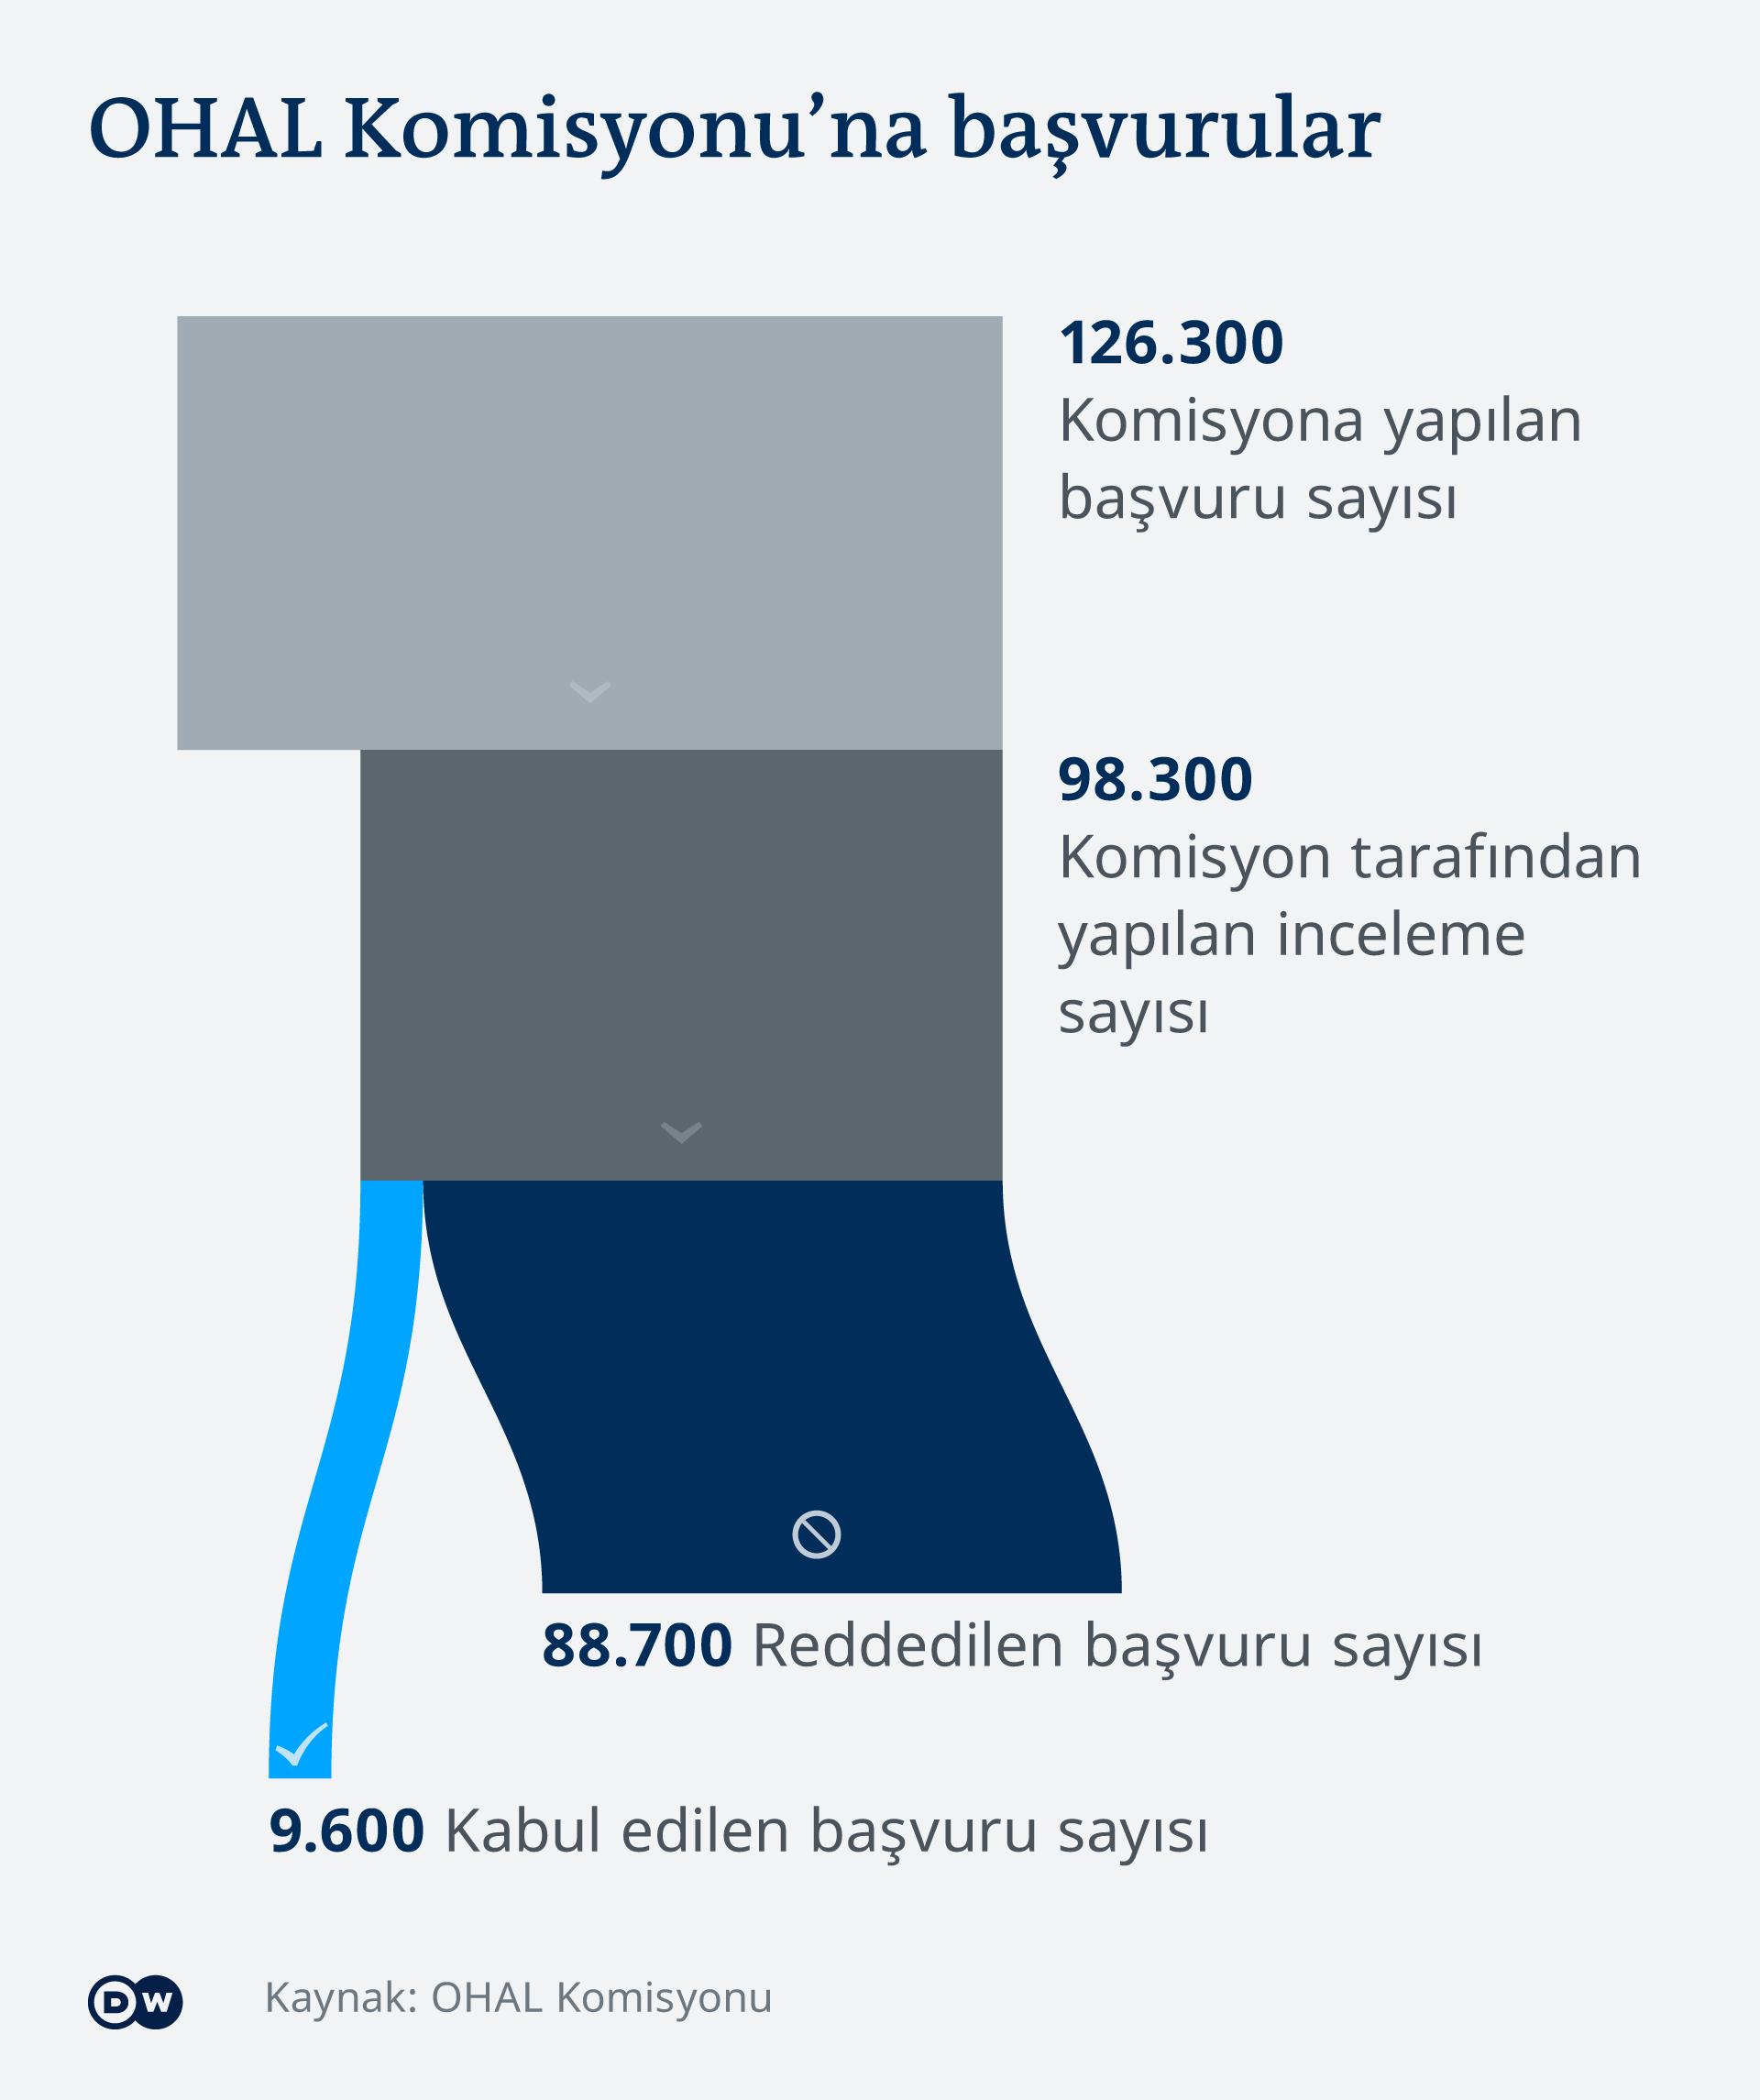 Infografik Beschwerden bei der OHAL-Kommission TR